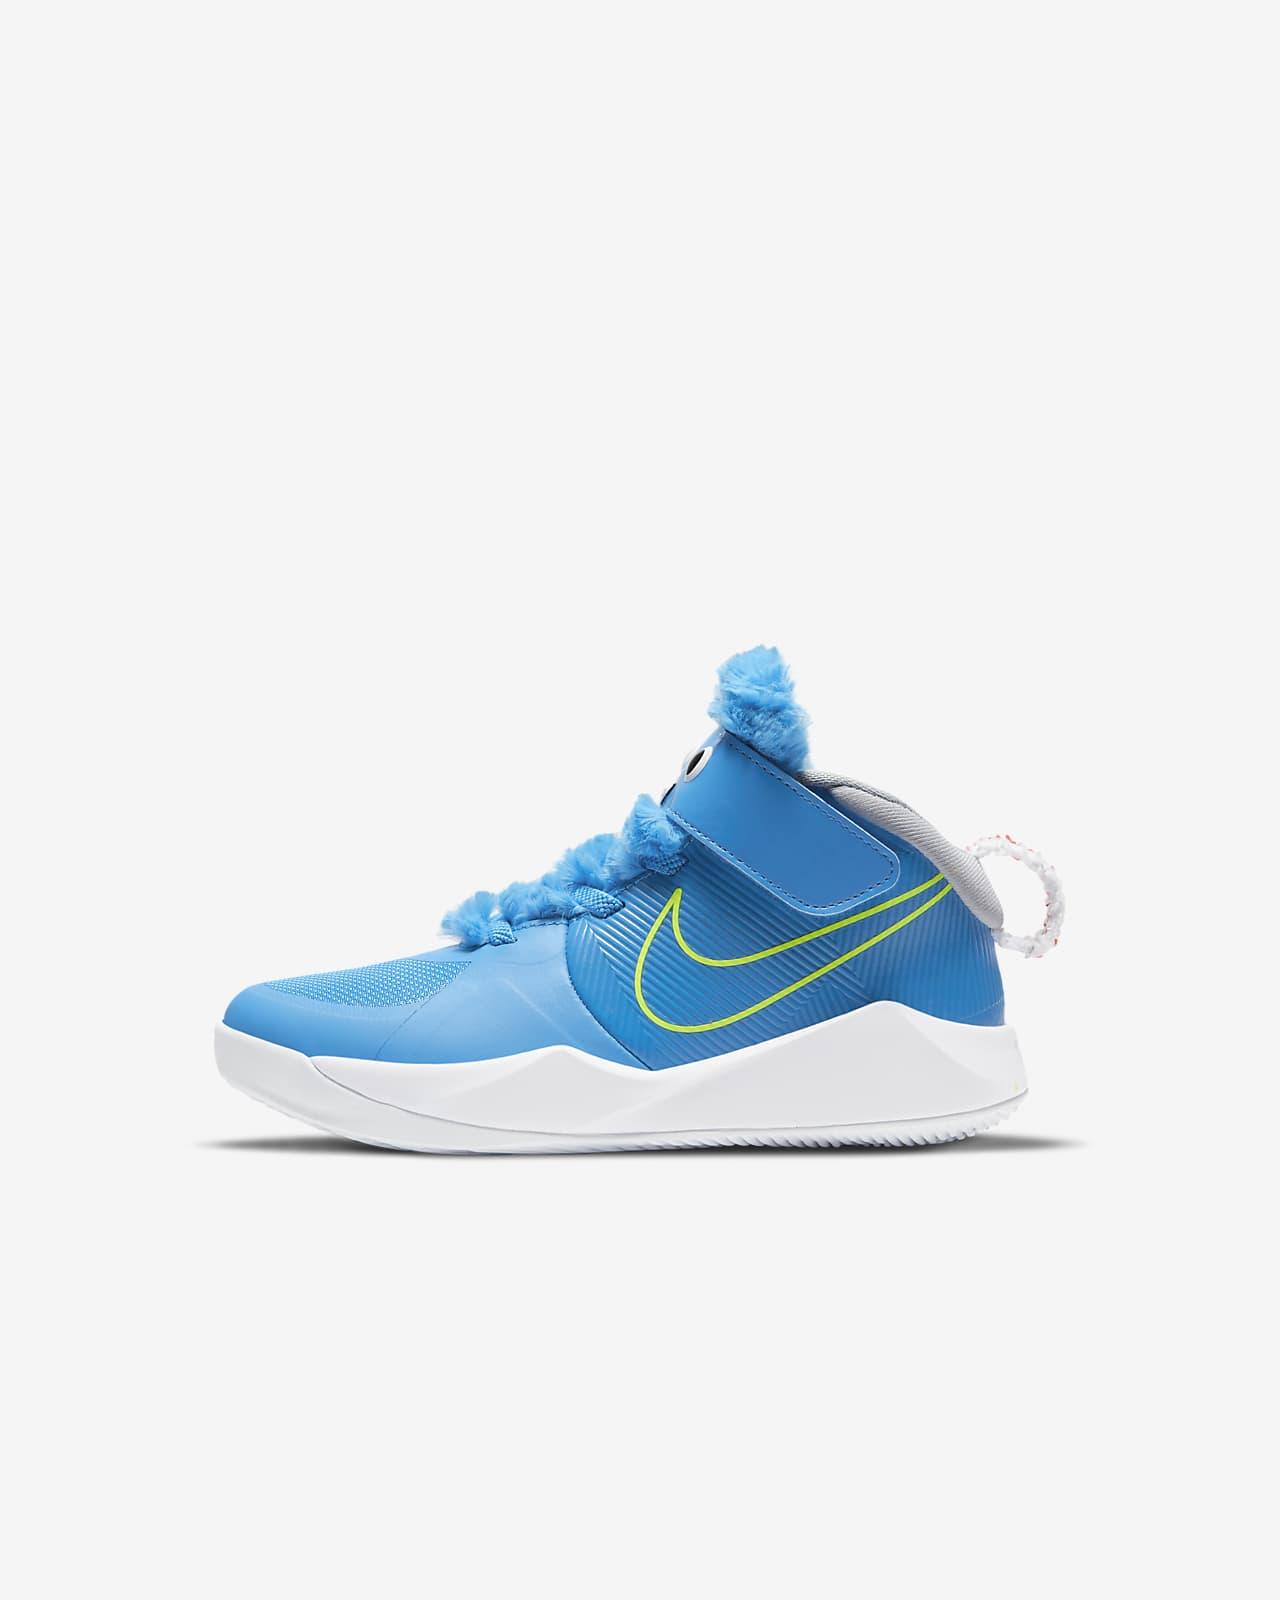 Nike Team Hustle D 9 Fast n Furry Younger Kids' Shoe